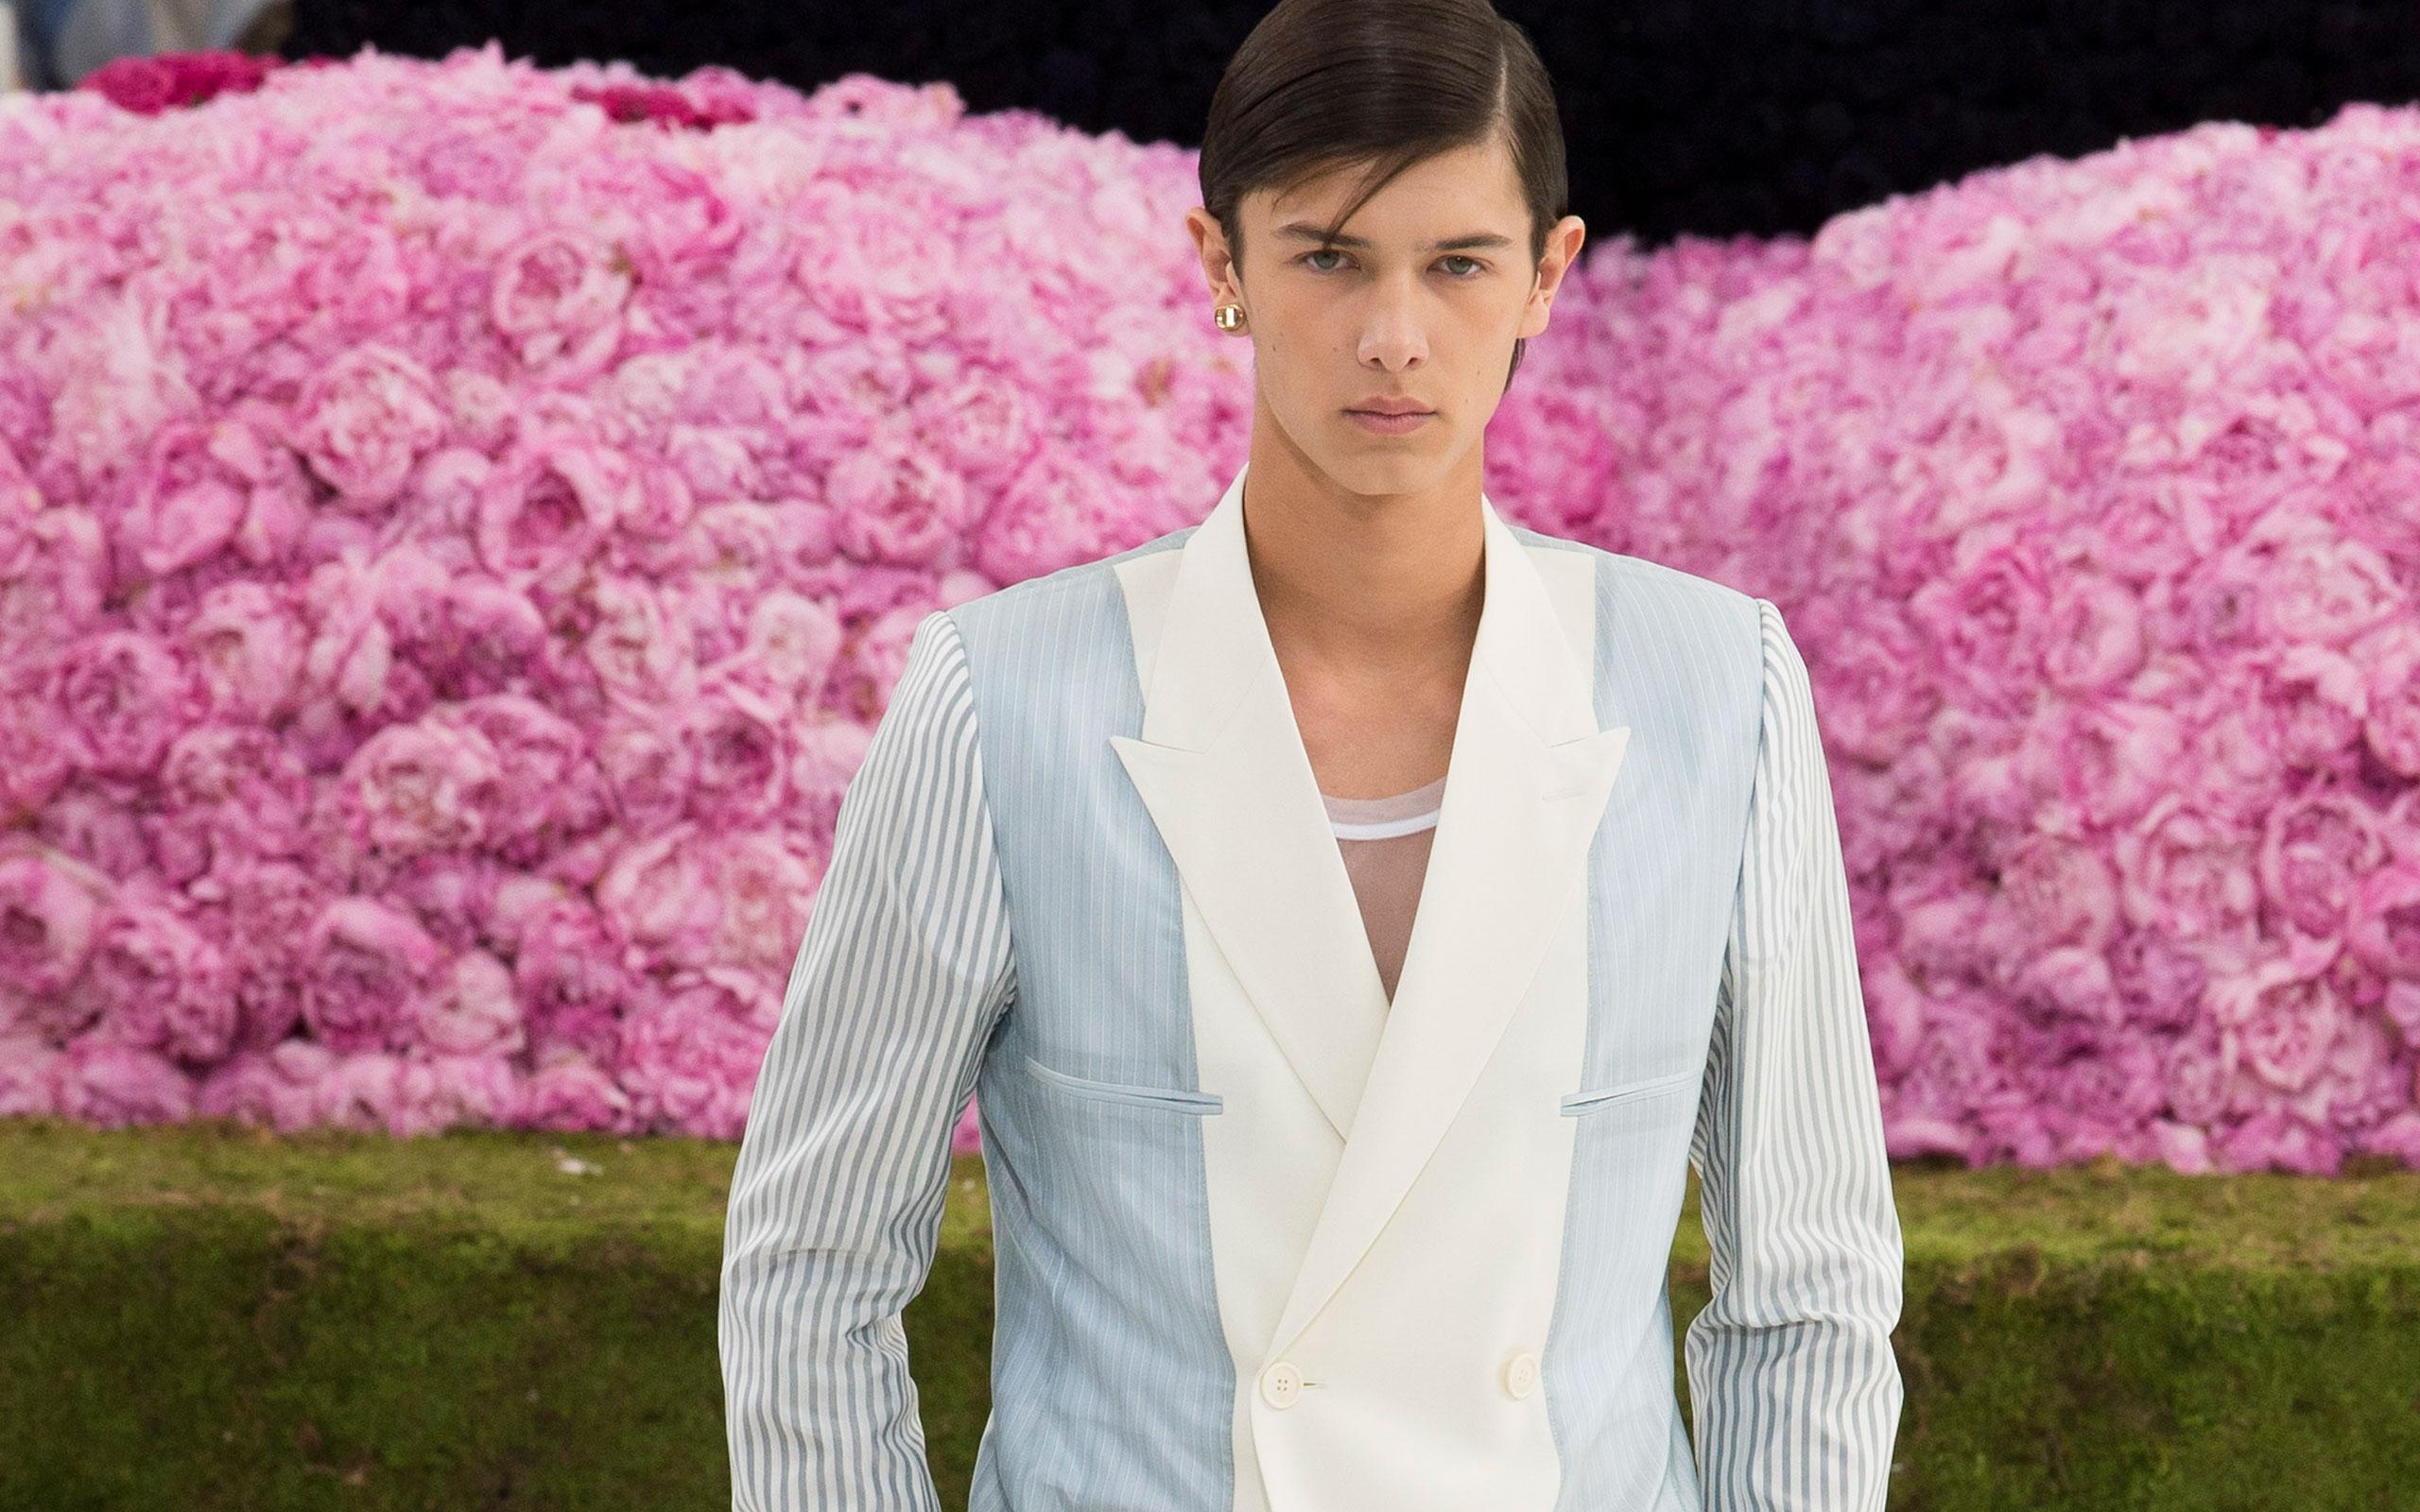 Dior Annouces The First Men's Pre-Fall Show Tokyo, November 30